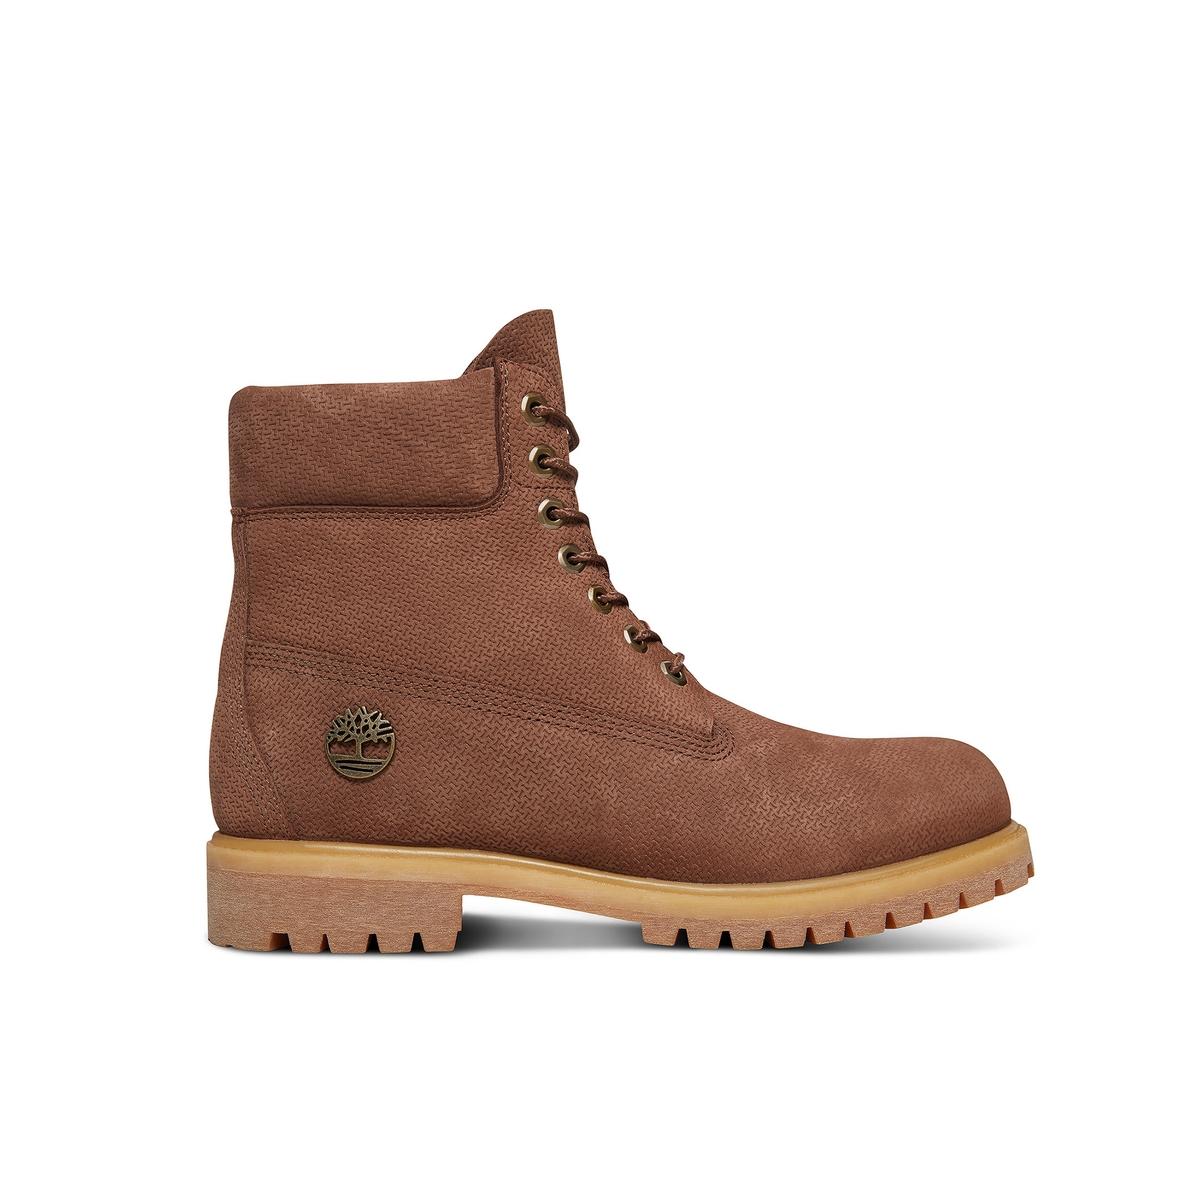 Botines de piel 6 Premium Boot